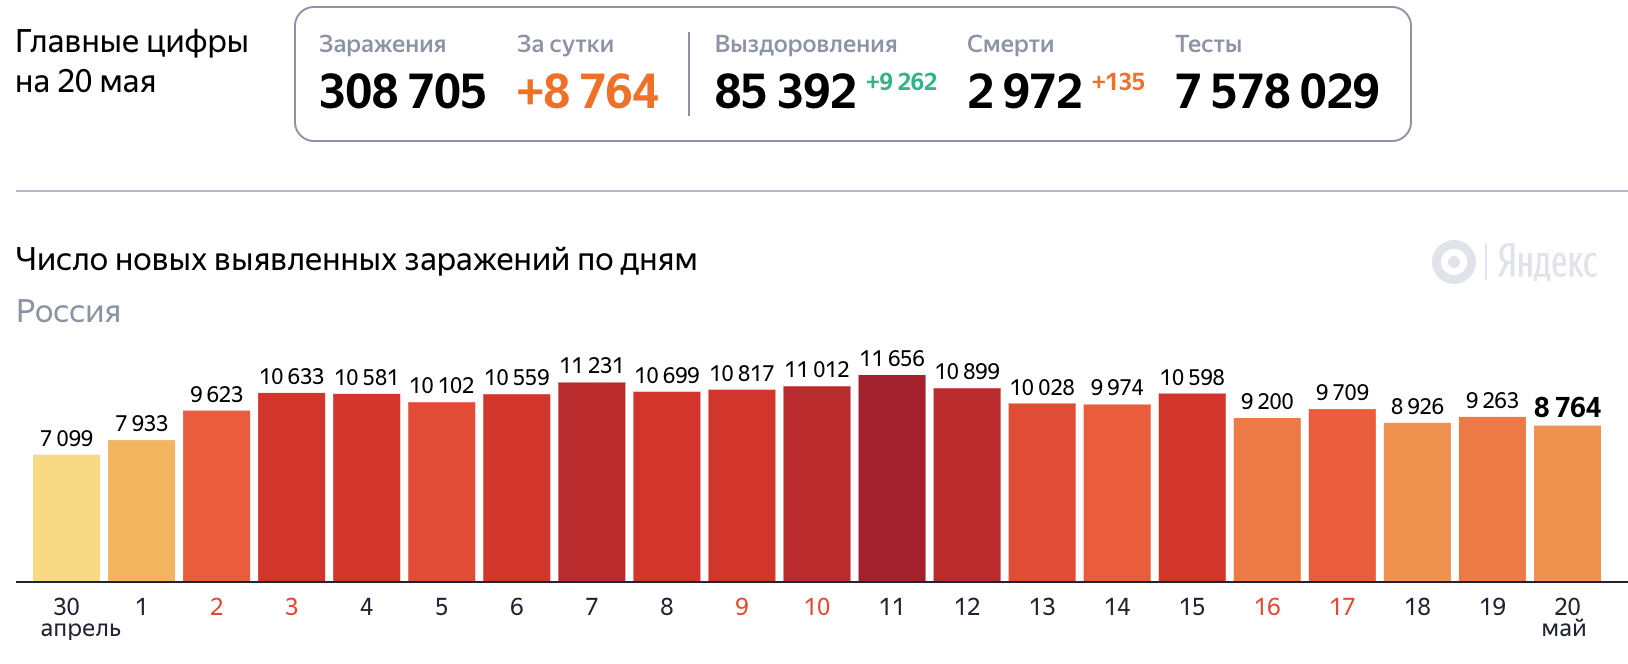 Коронавирус на 20 мая 2020 года статистика в России